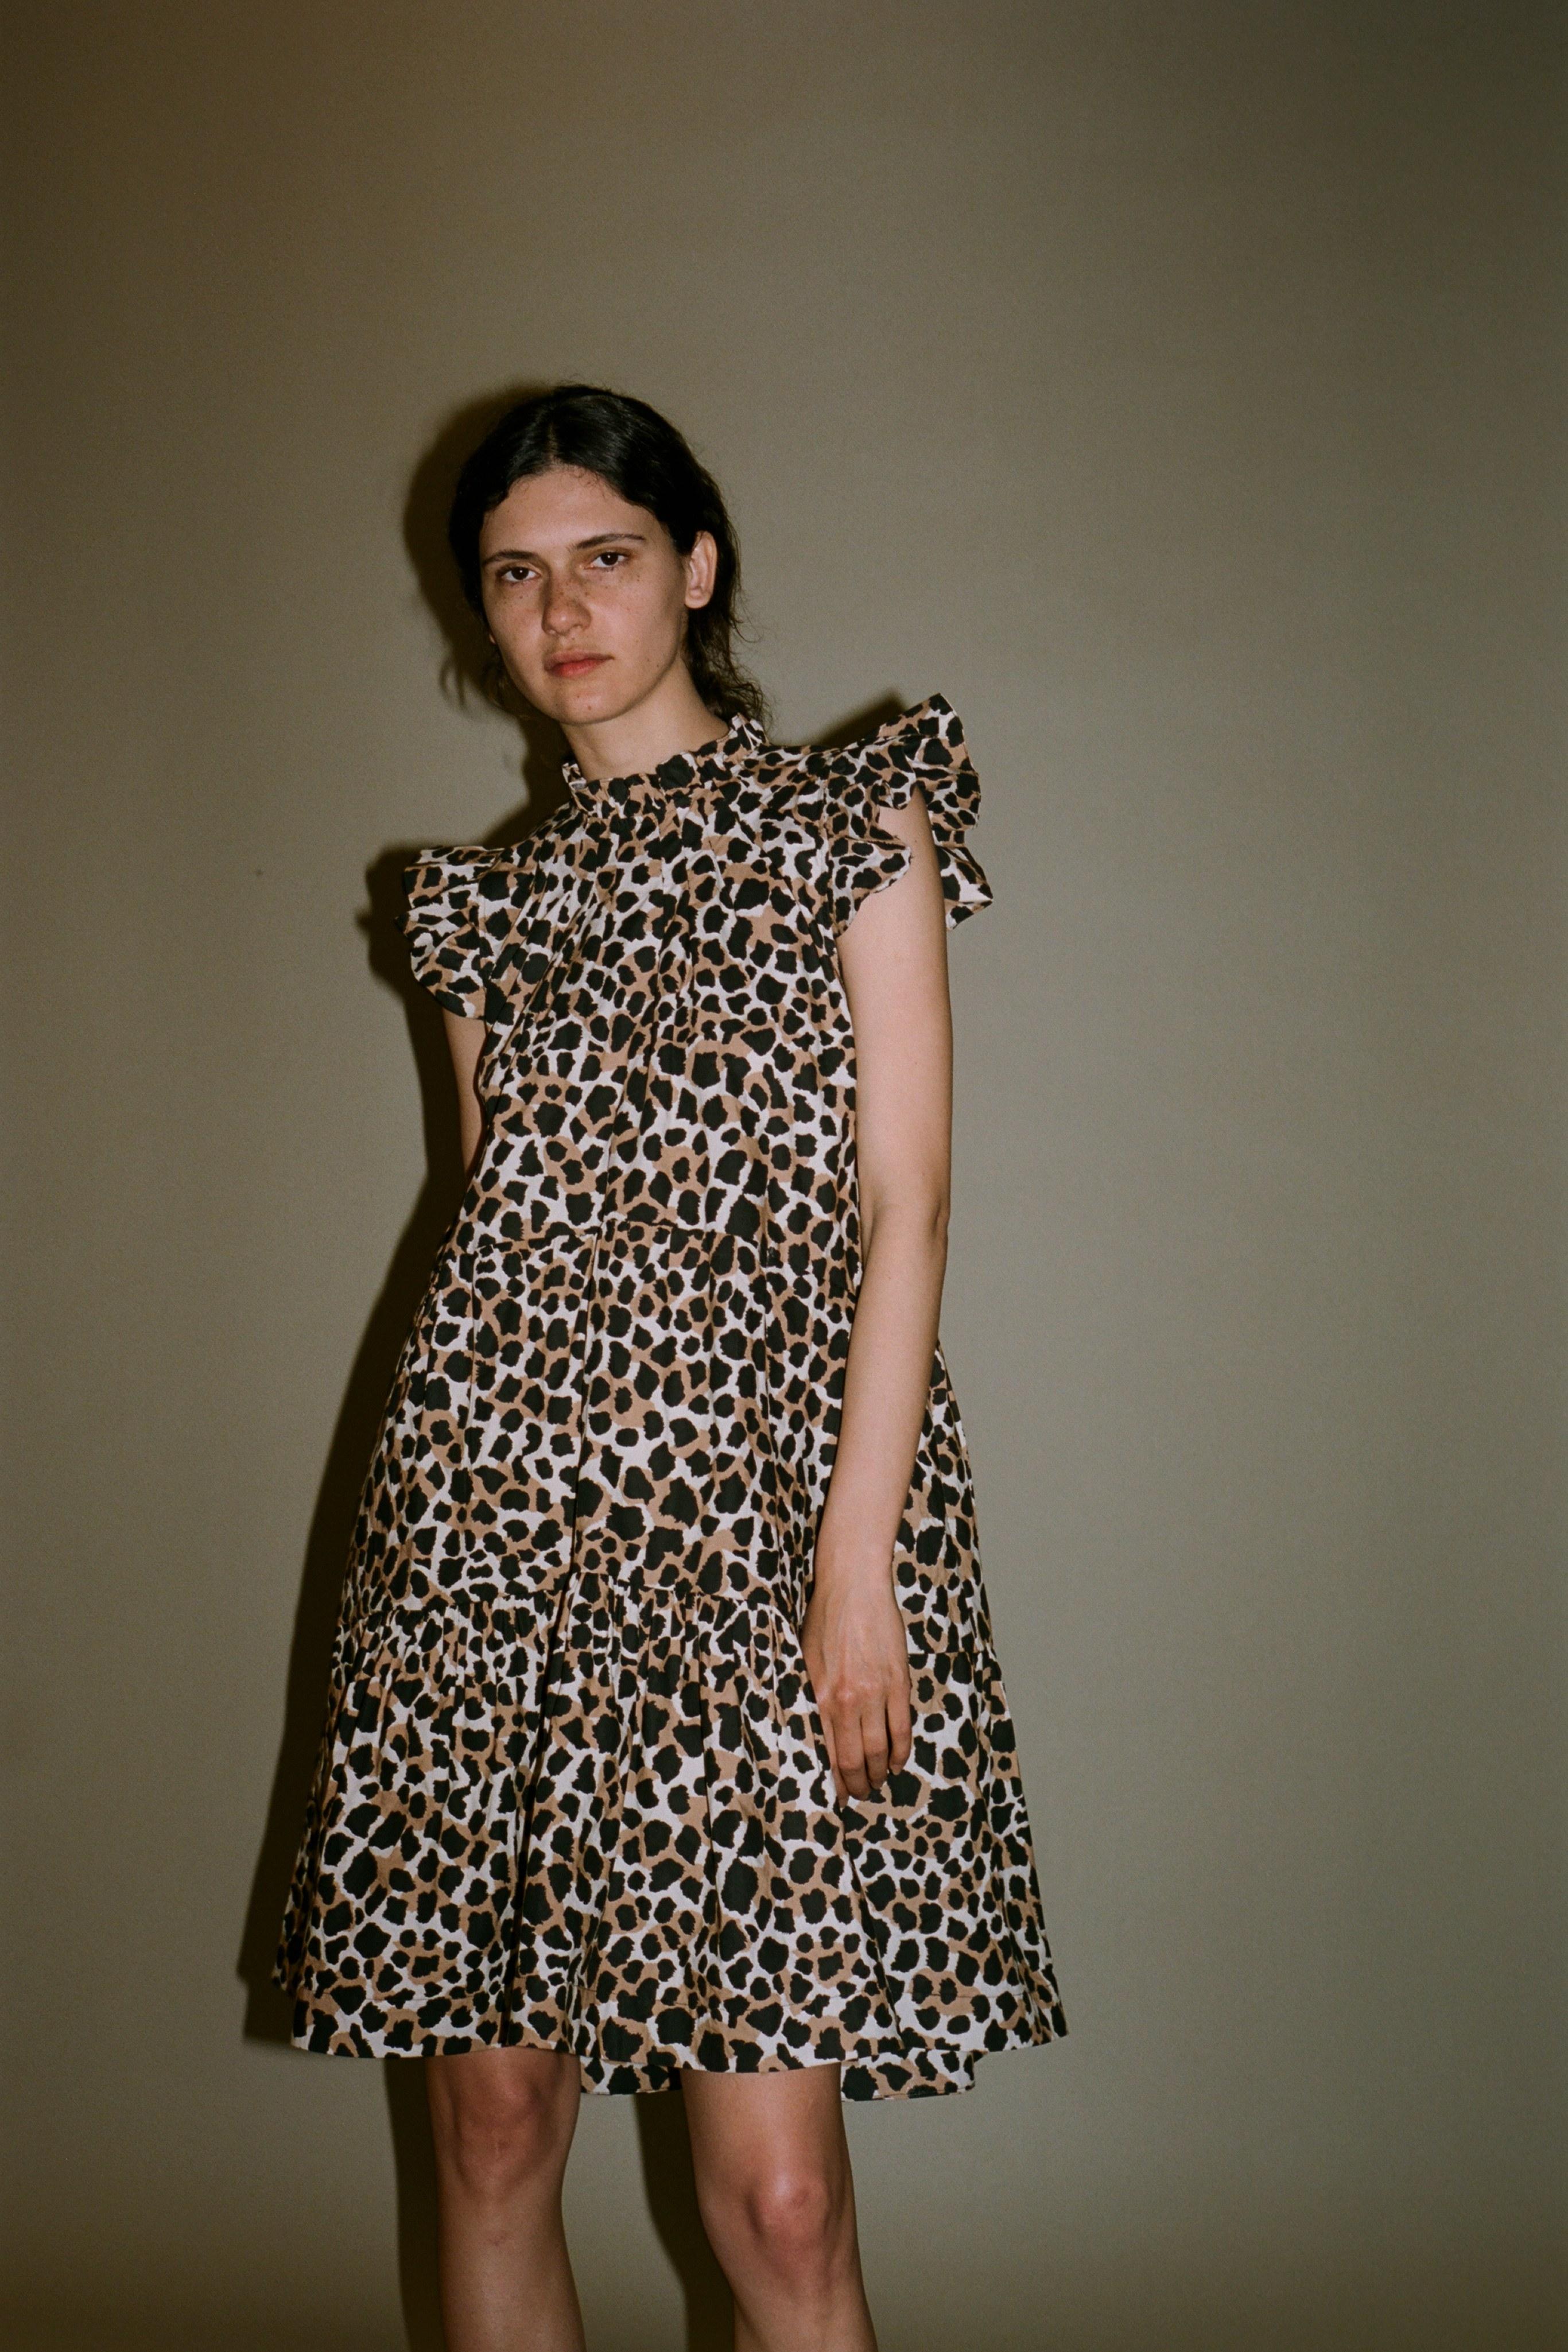 Apollo leopard print tiered dress